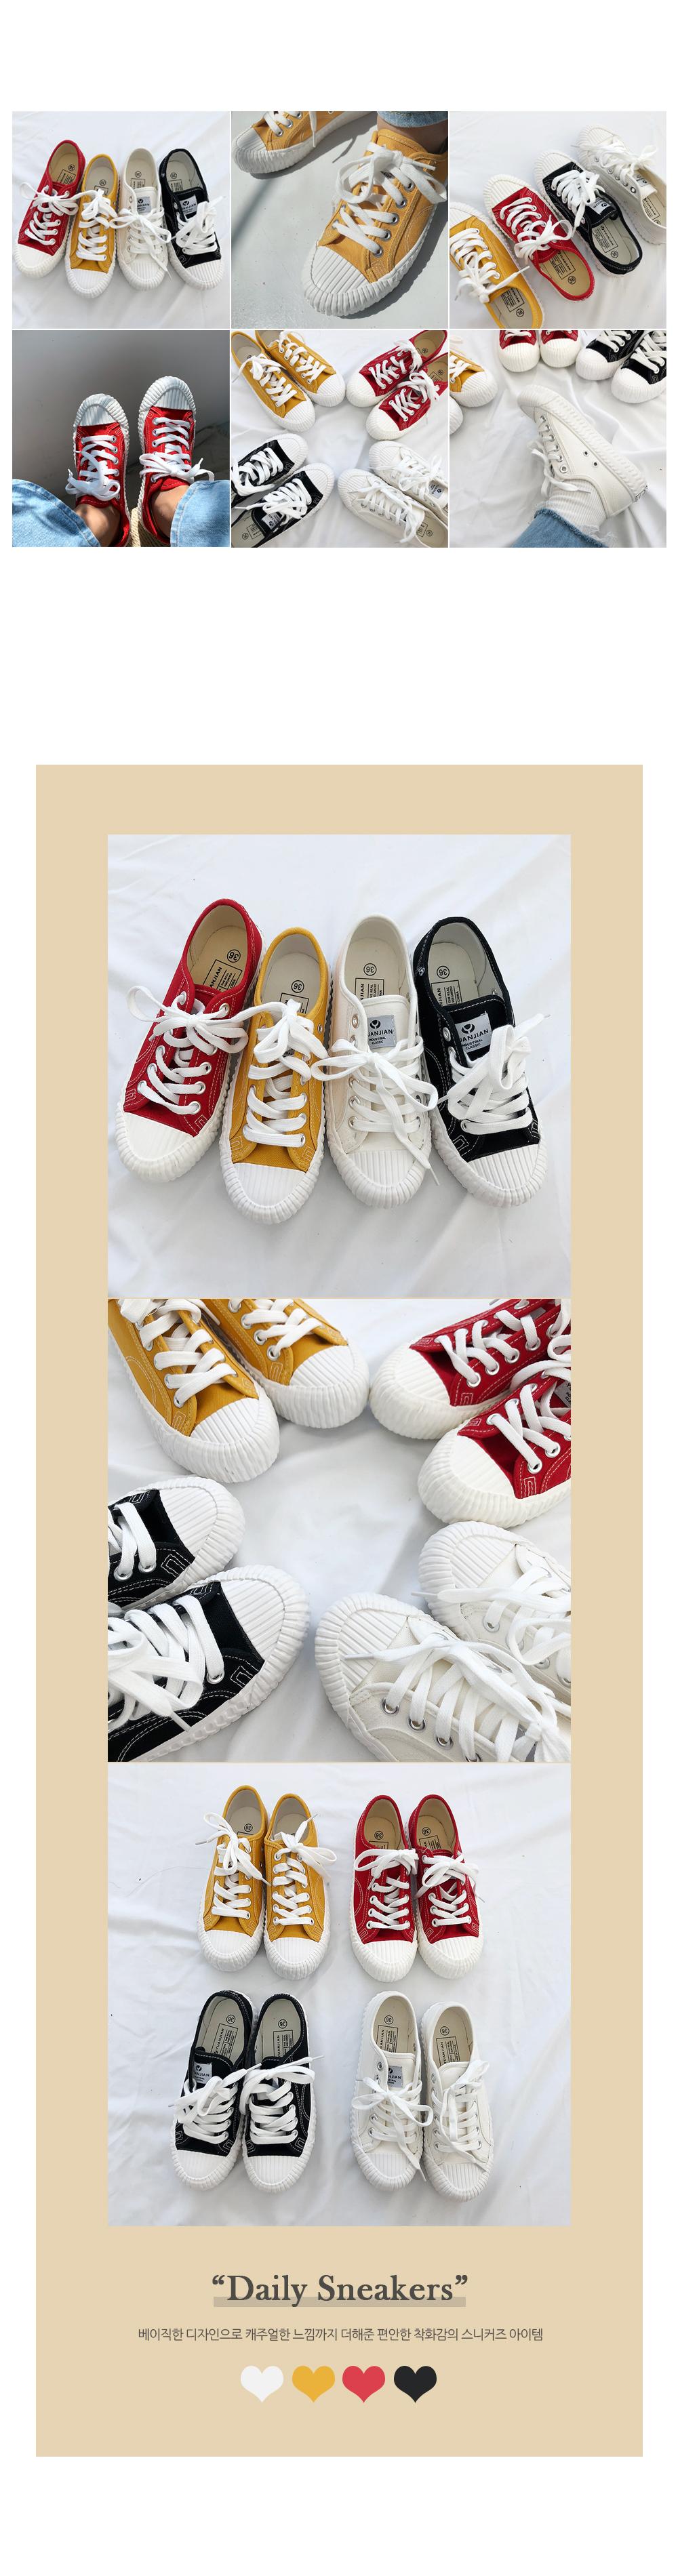 Hamilton sneakers